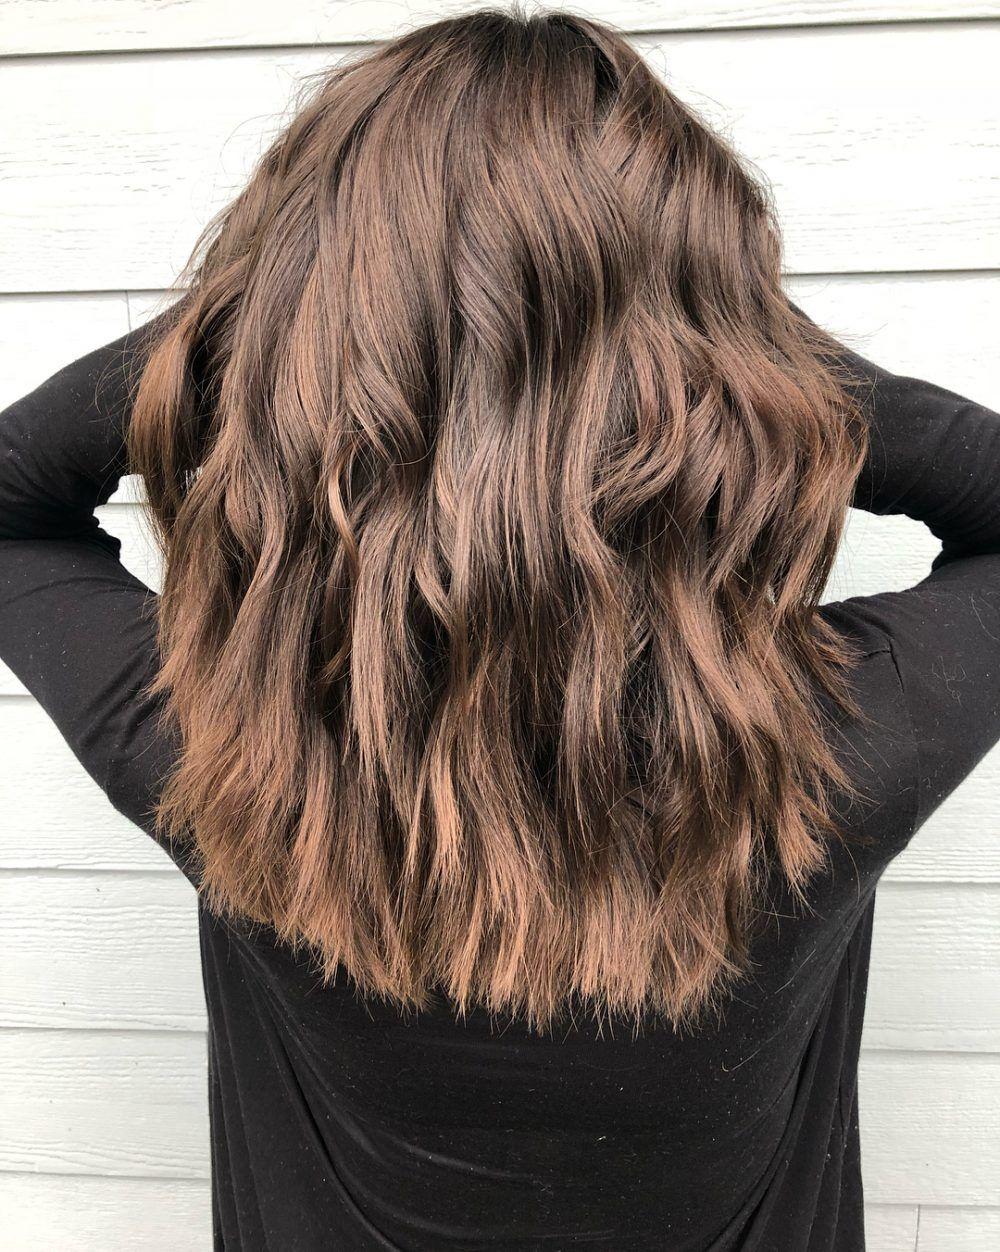 34 best choppy layered hairstyles (that will flatter anyone